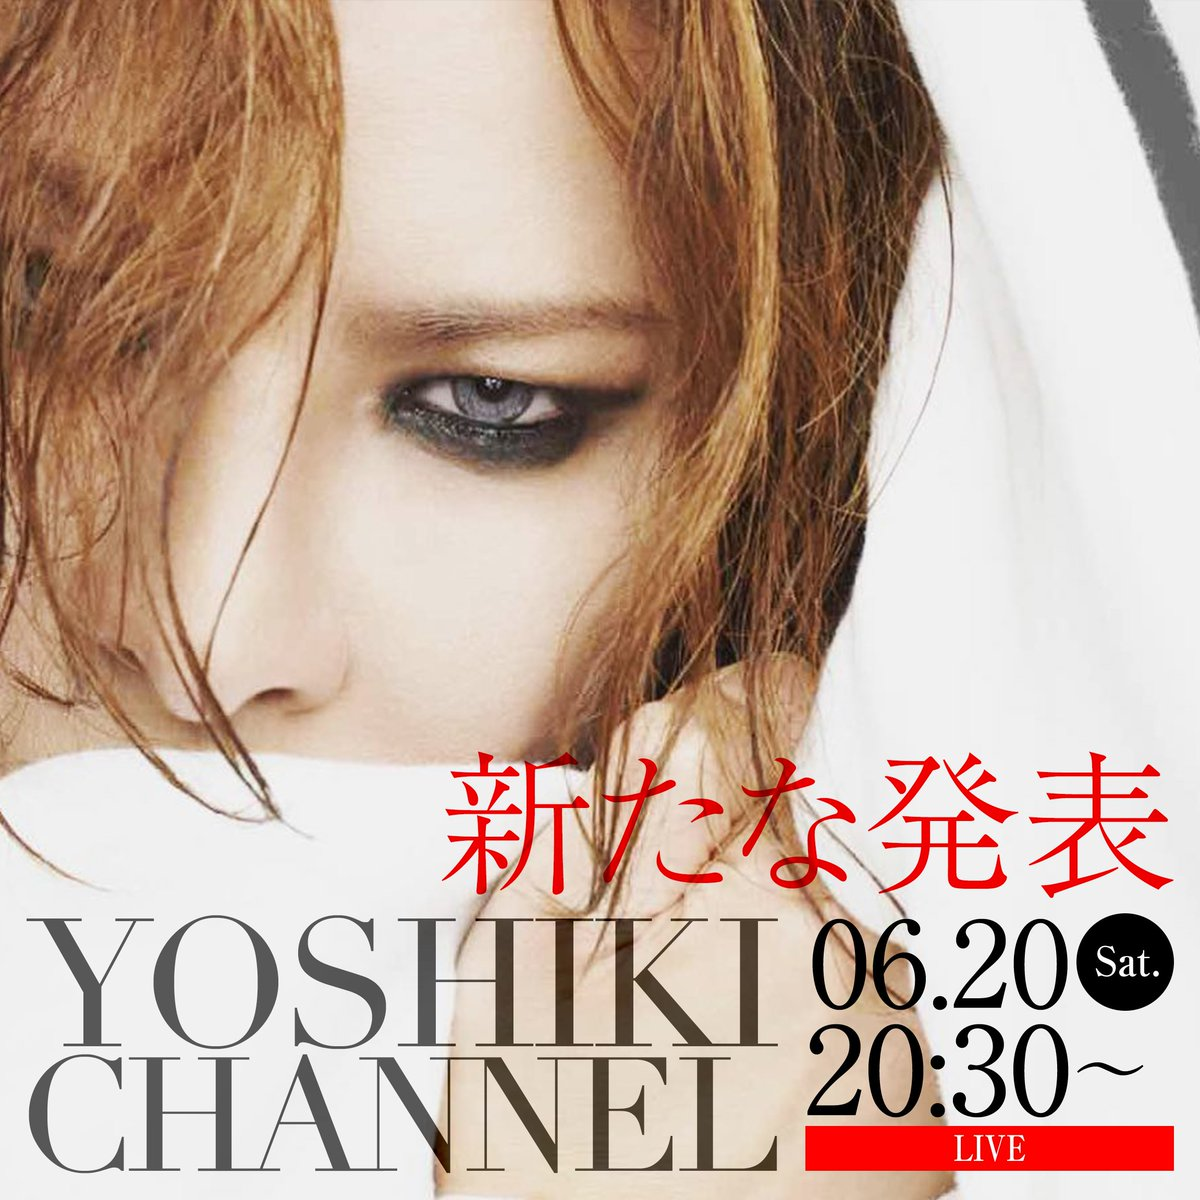 RT@YoshikiChannel【6/20(Sat) 20:30(JST) LIVE】#YOSHIKI 新たな発表 !#AskYoshiki #LA 自宅からセルフ配信 PART6 インスタにて質問募集中Post your #AskYoshiki questions on @YoshikiOfficial's #instagram  & Intl→